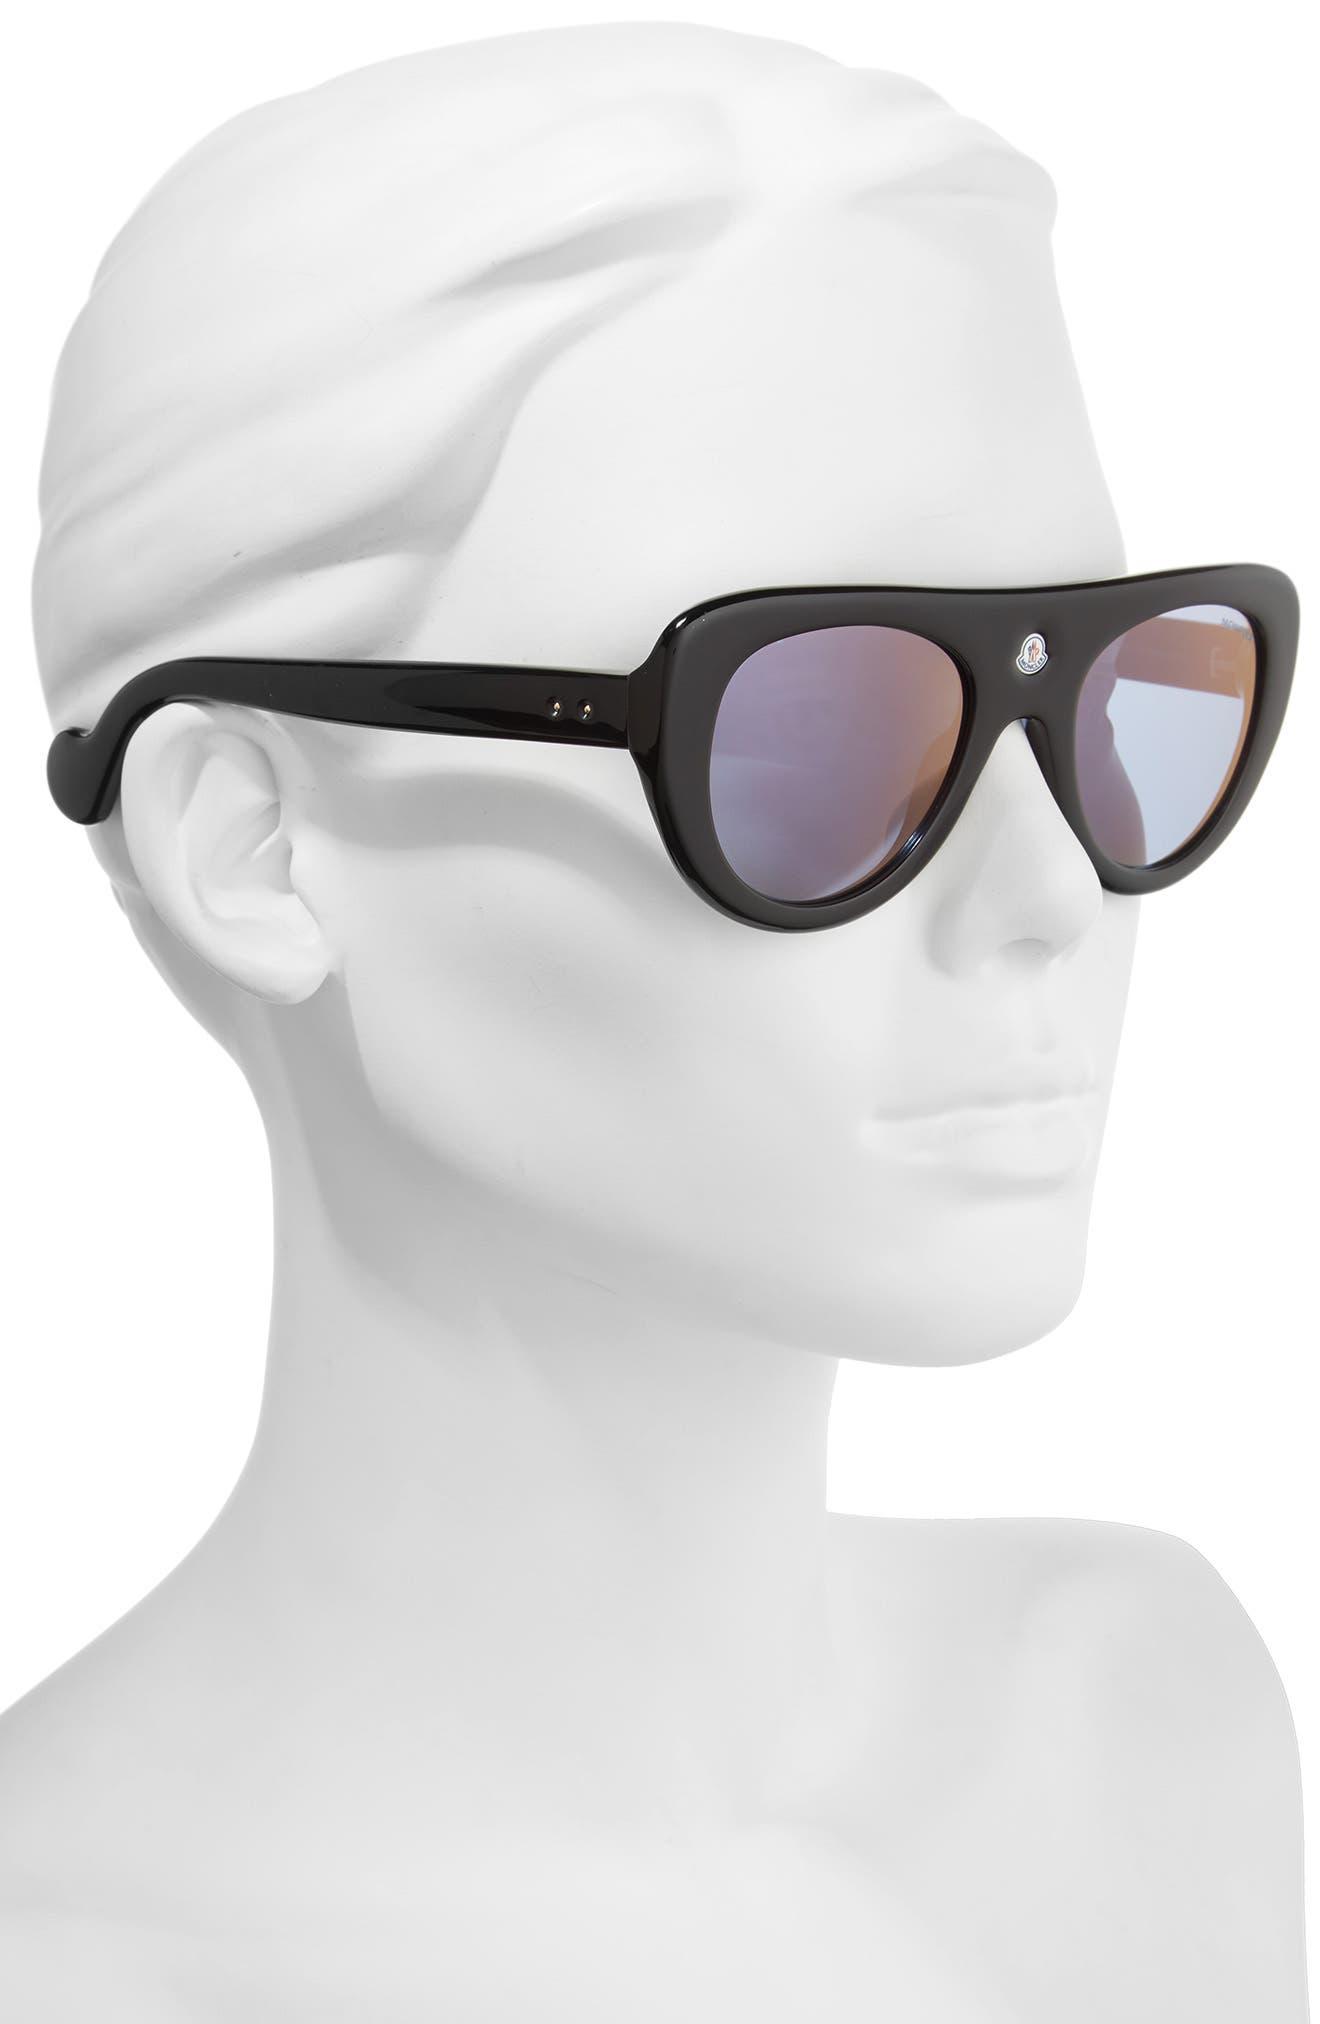 51mm Shield Sunglasses,                             Alternate thumbnail 2, color,                             001